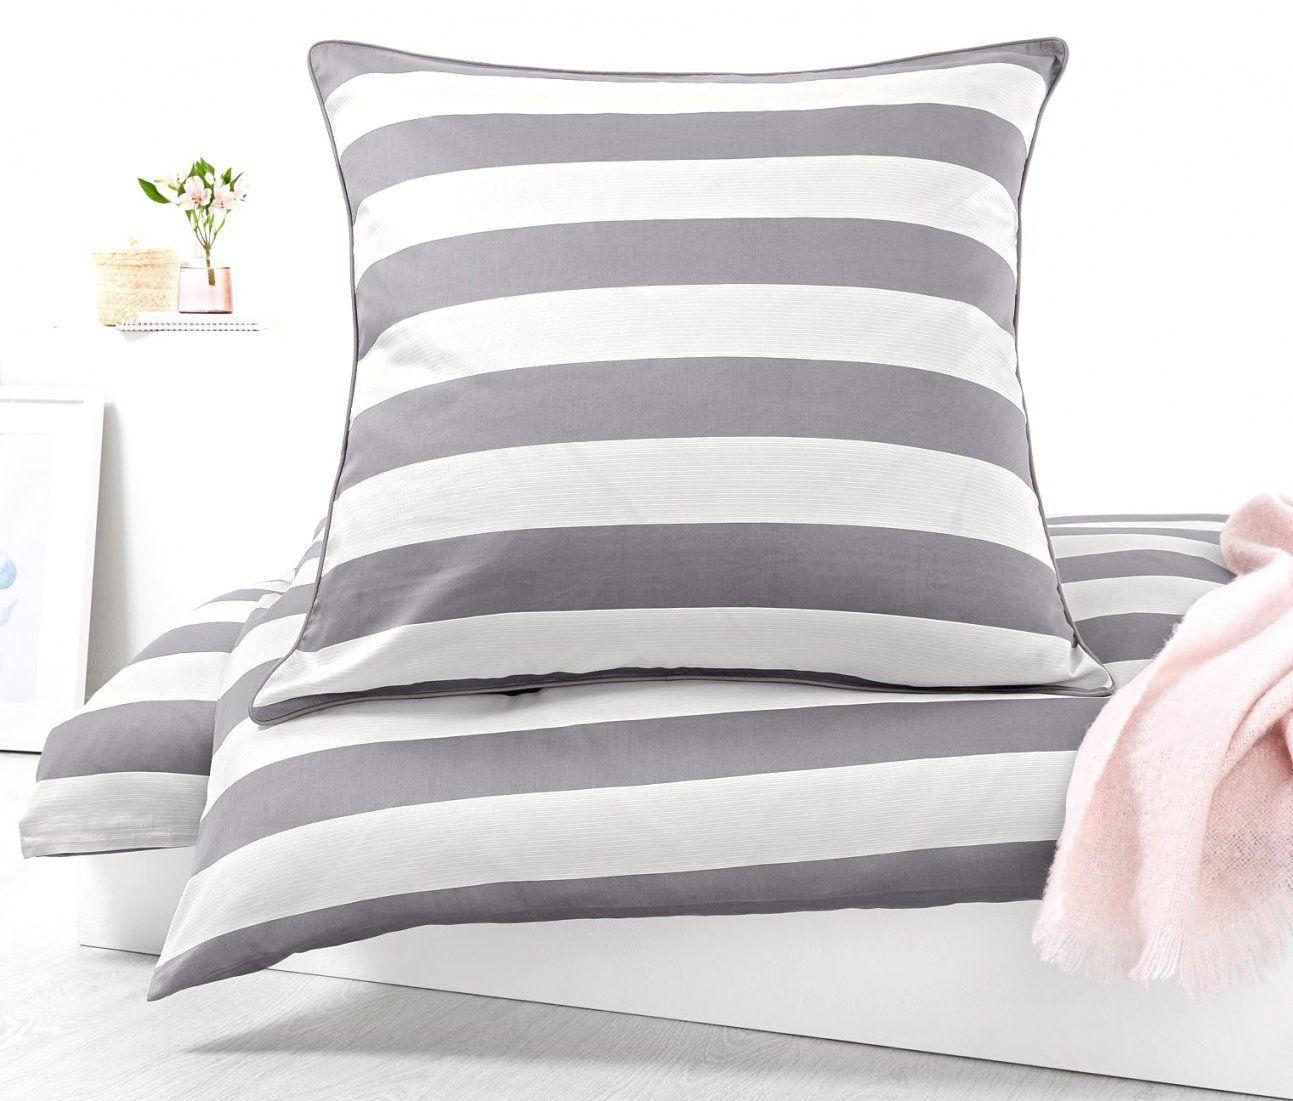 Spektakuläre Inspiration Normale Bettwäsche Maße Und Satin Online von Normale Bettwäsche Maße Photo